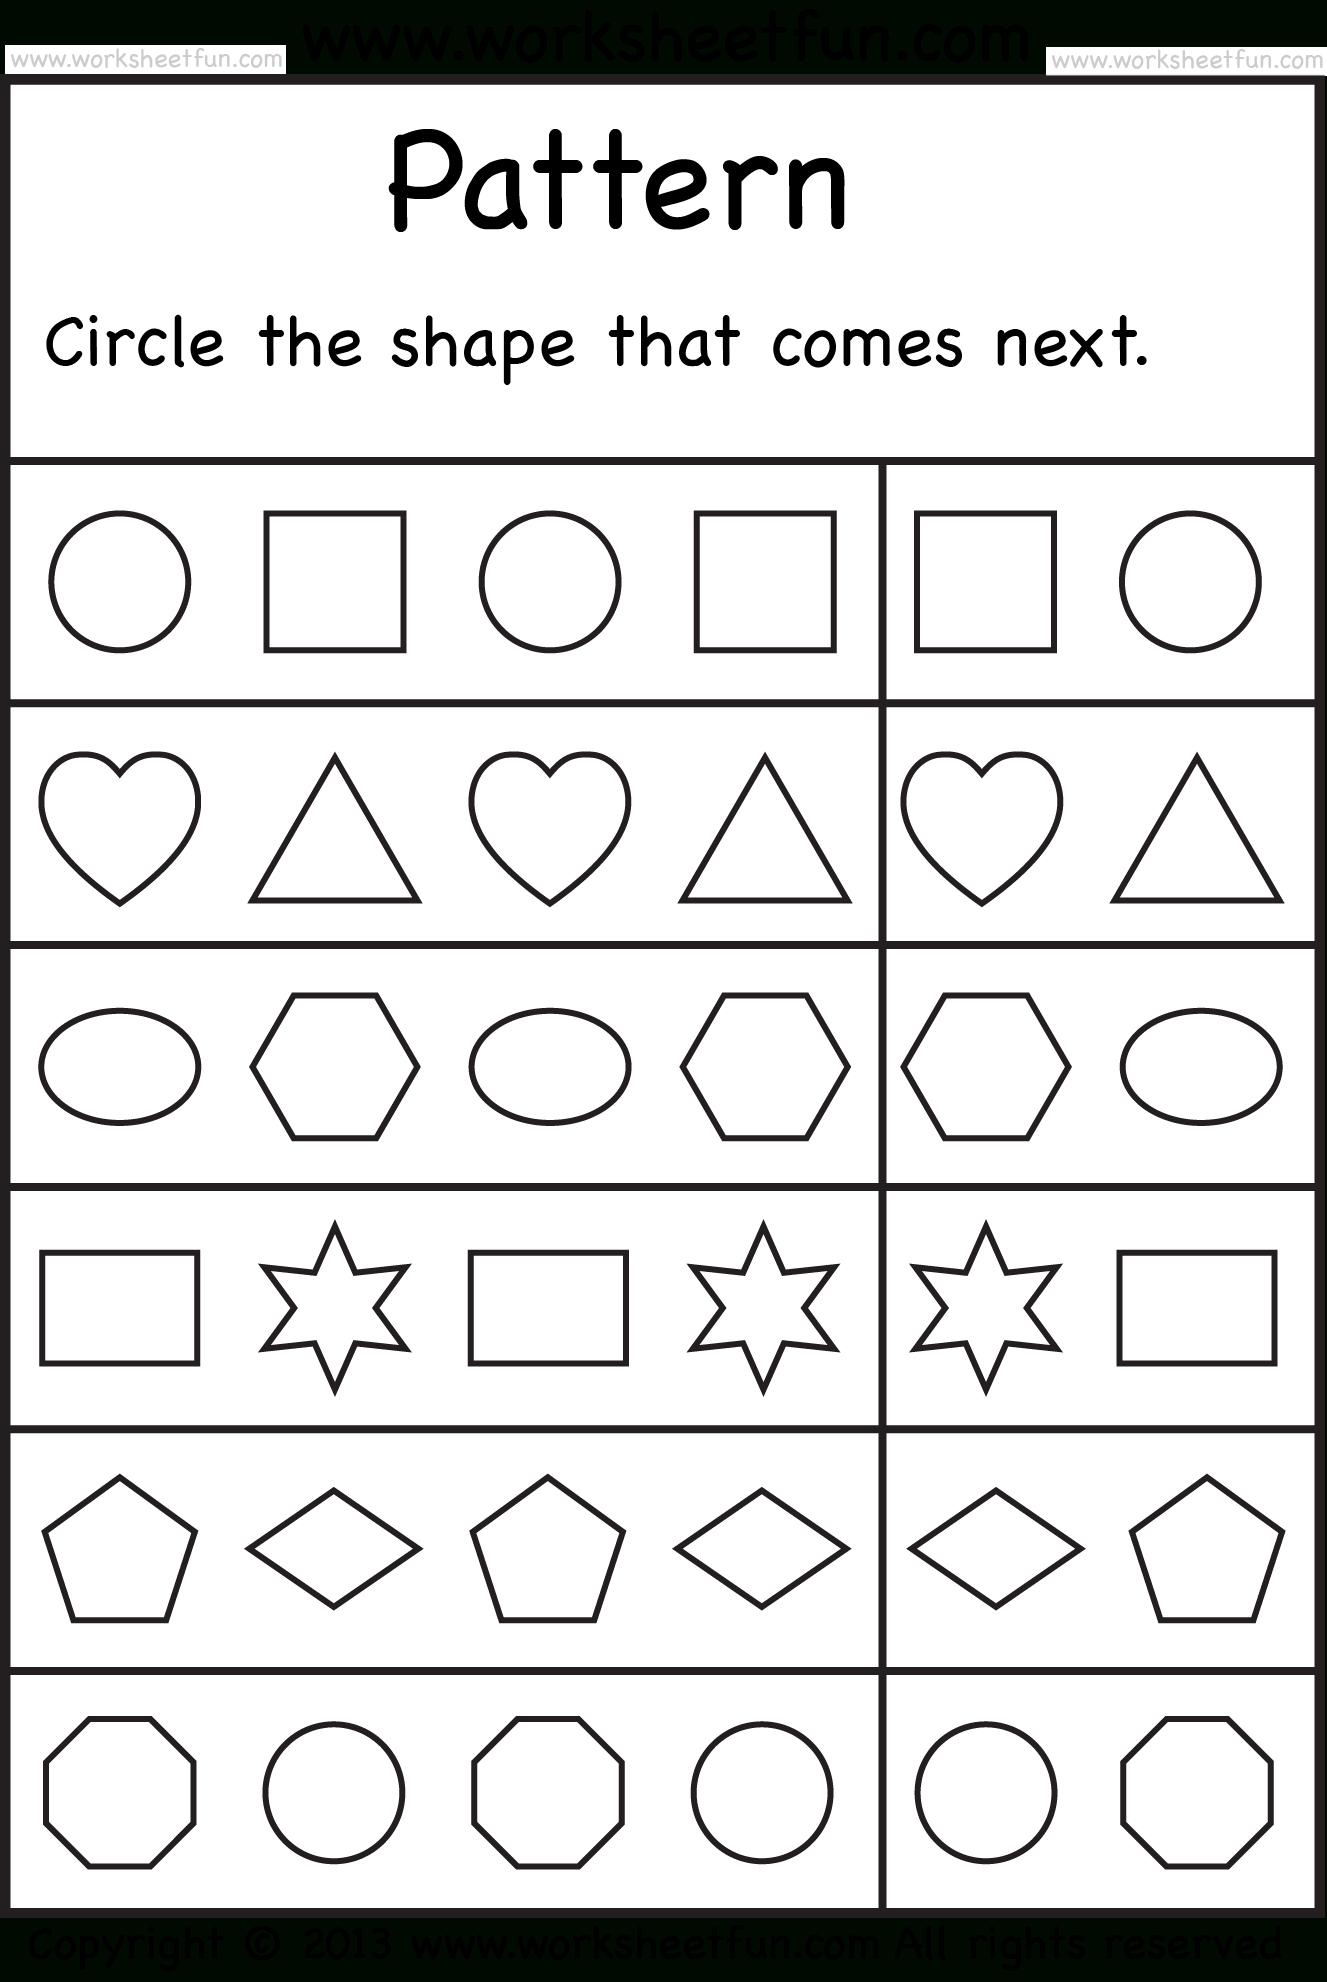 Free Printable Worksheets – Worksheetfun / Free Printable - Free | Free Printable Sequencing Worksheets For Kindergarten